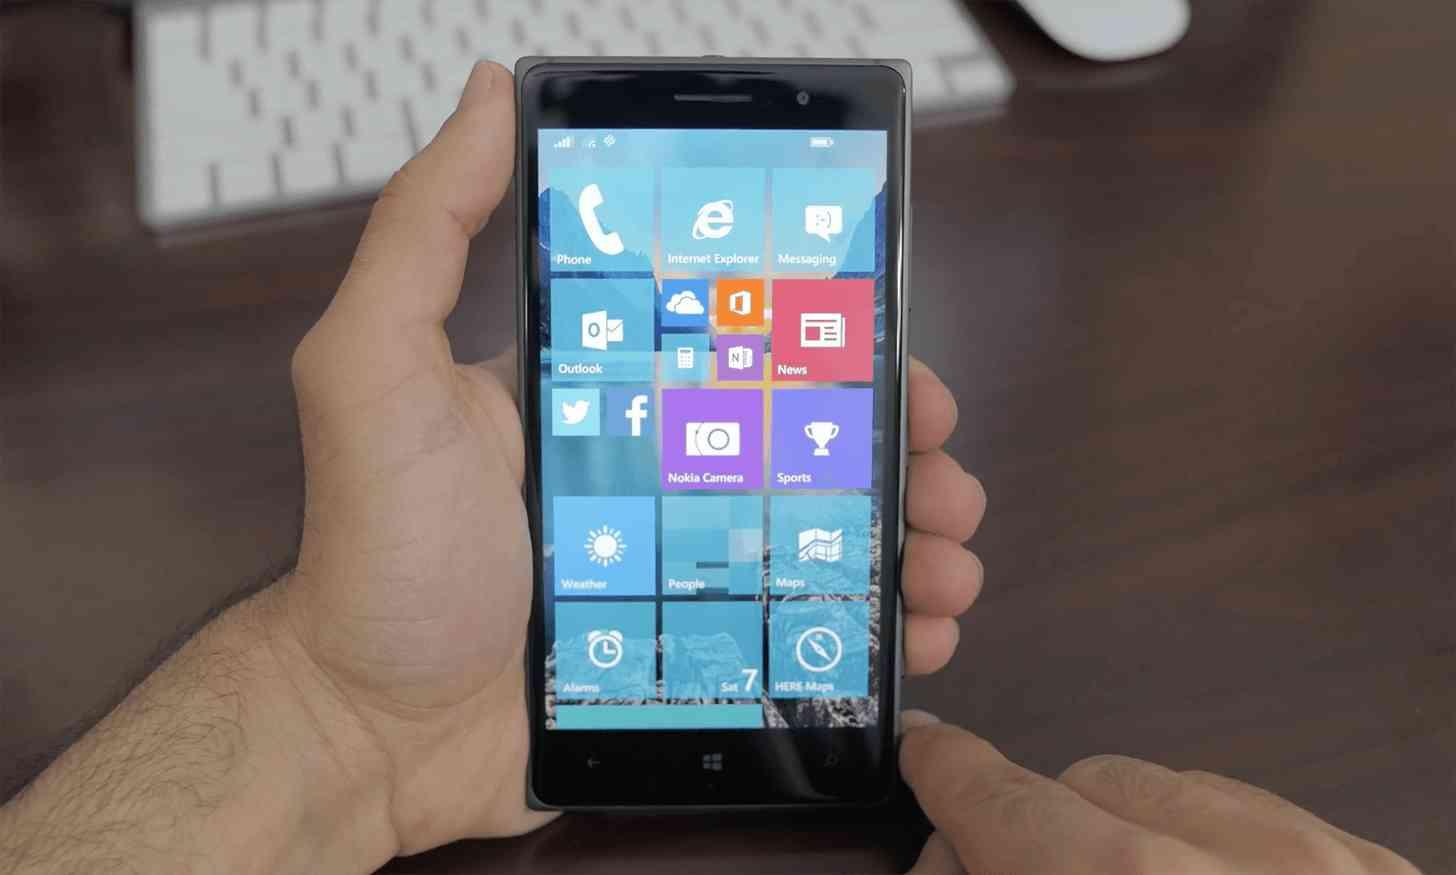 Windows 10 Mobile hands on Lumia 830